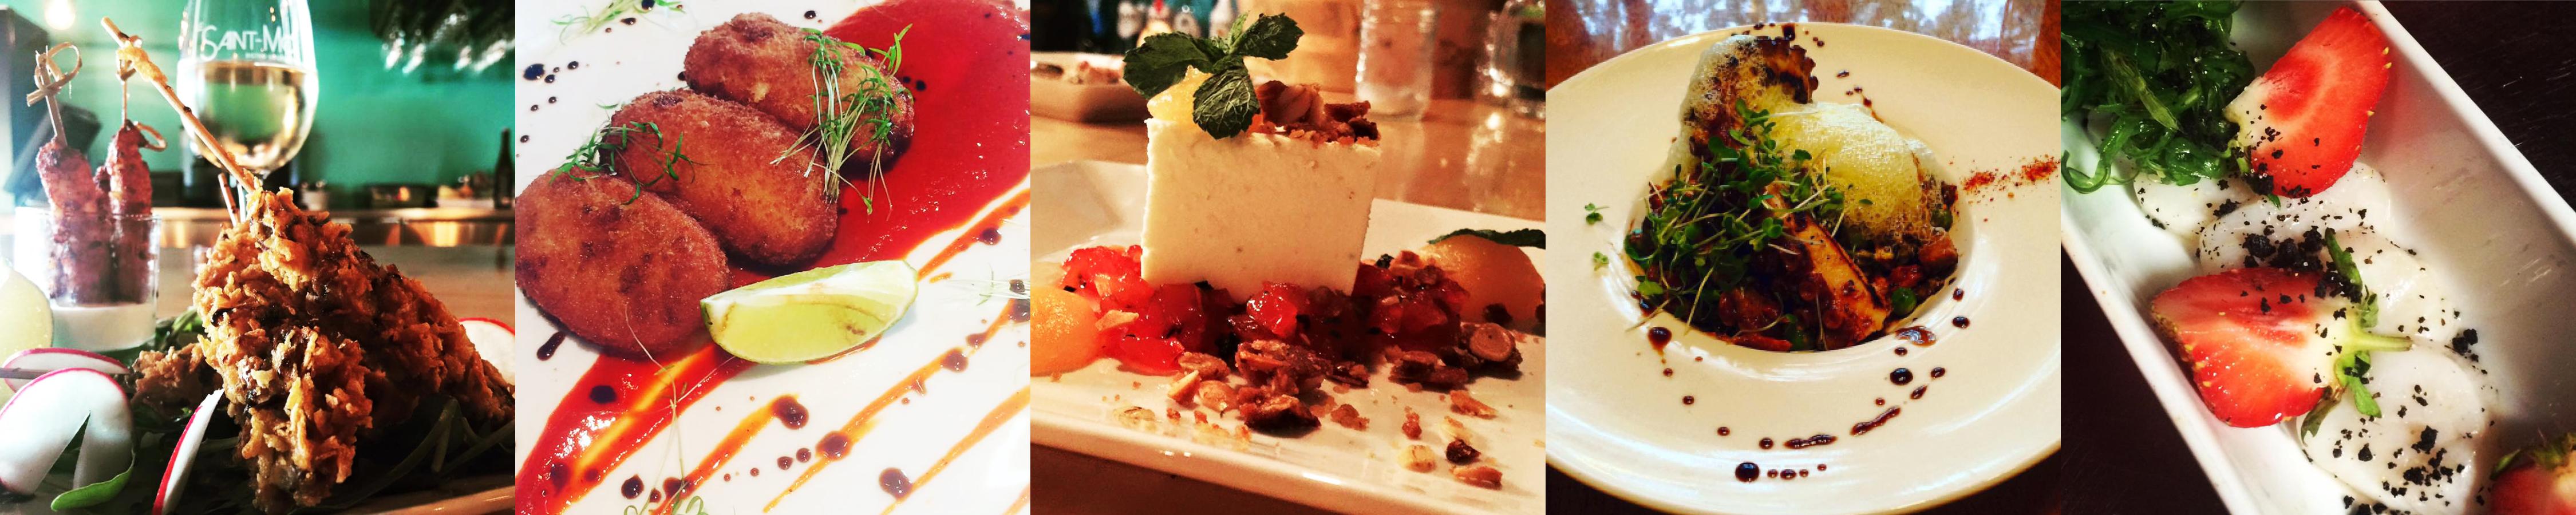 Restaurant Le Saint-Mo bistro gourmand Shawinigan